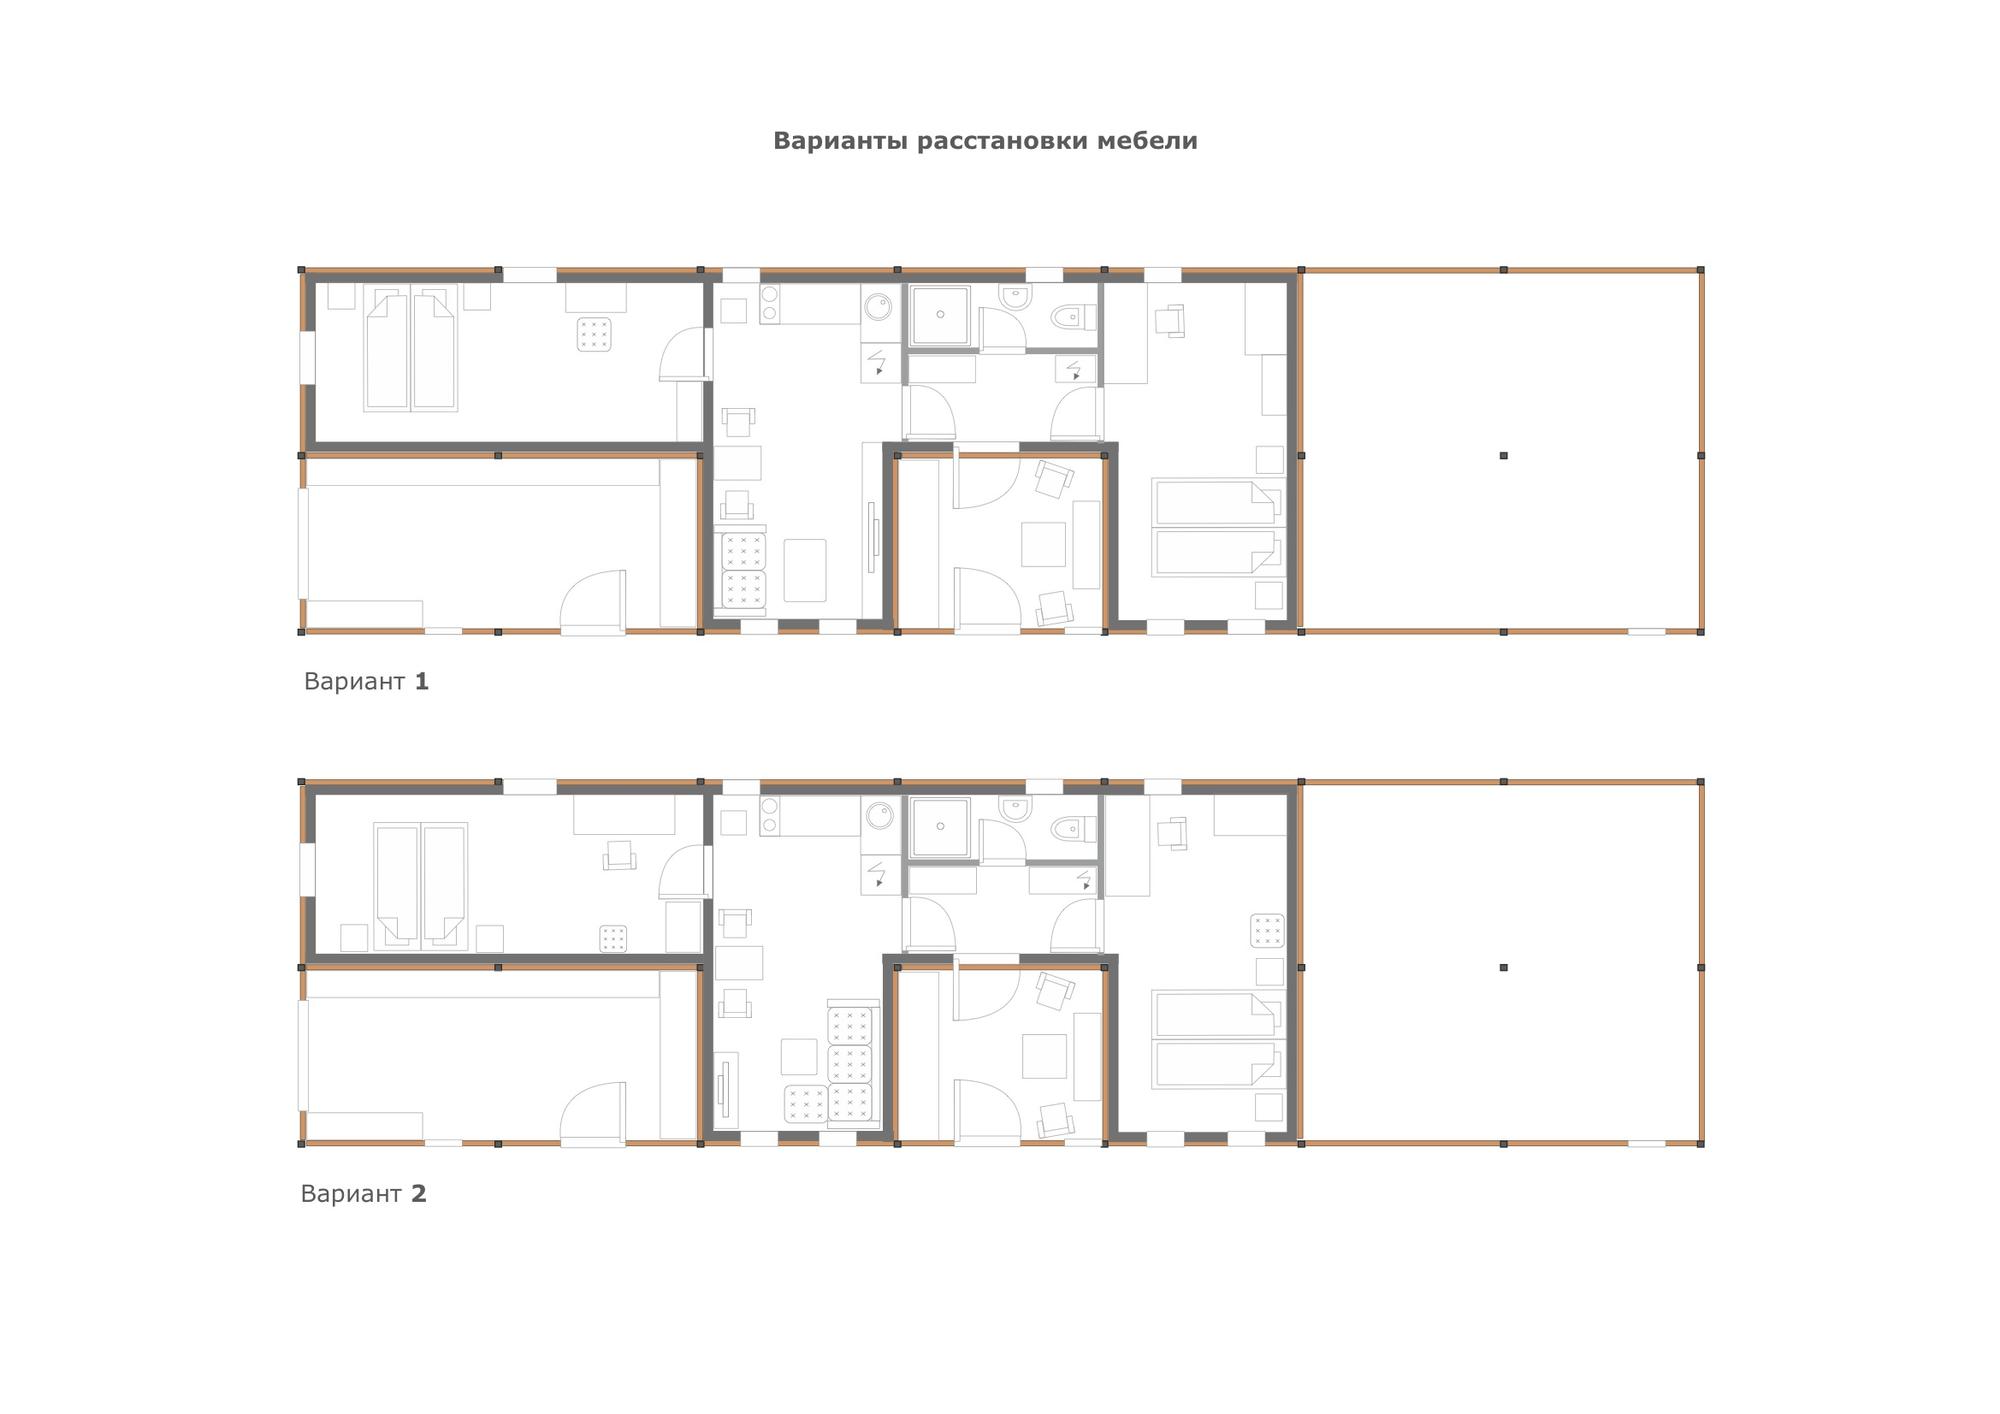 51ef1075e8e44ea5b7000098_deco-pattern-house-peter-kostelov_floor_plans